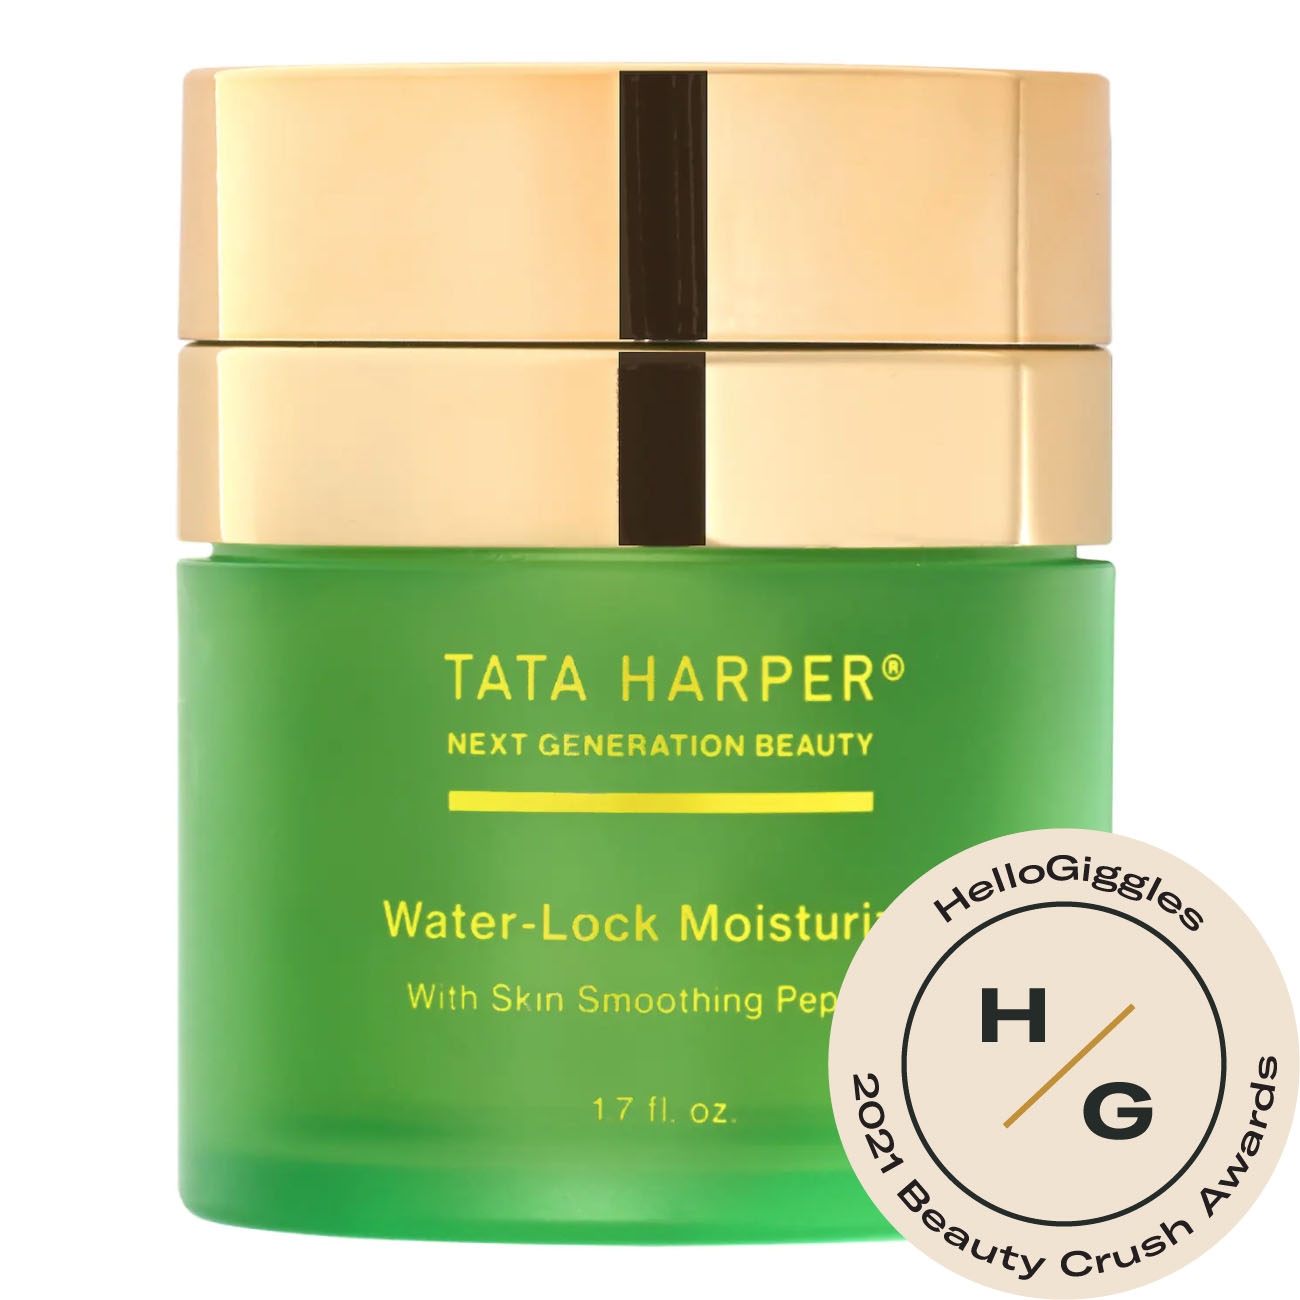 katey denno skincare routine tata harper water-lock beauty crush awards hellogiggles